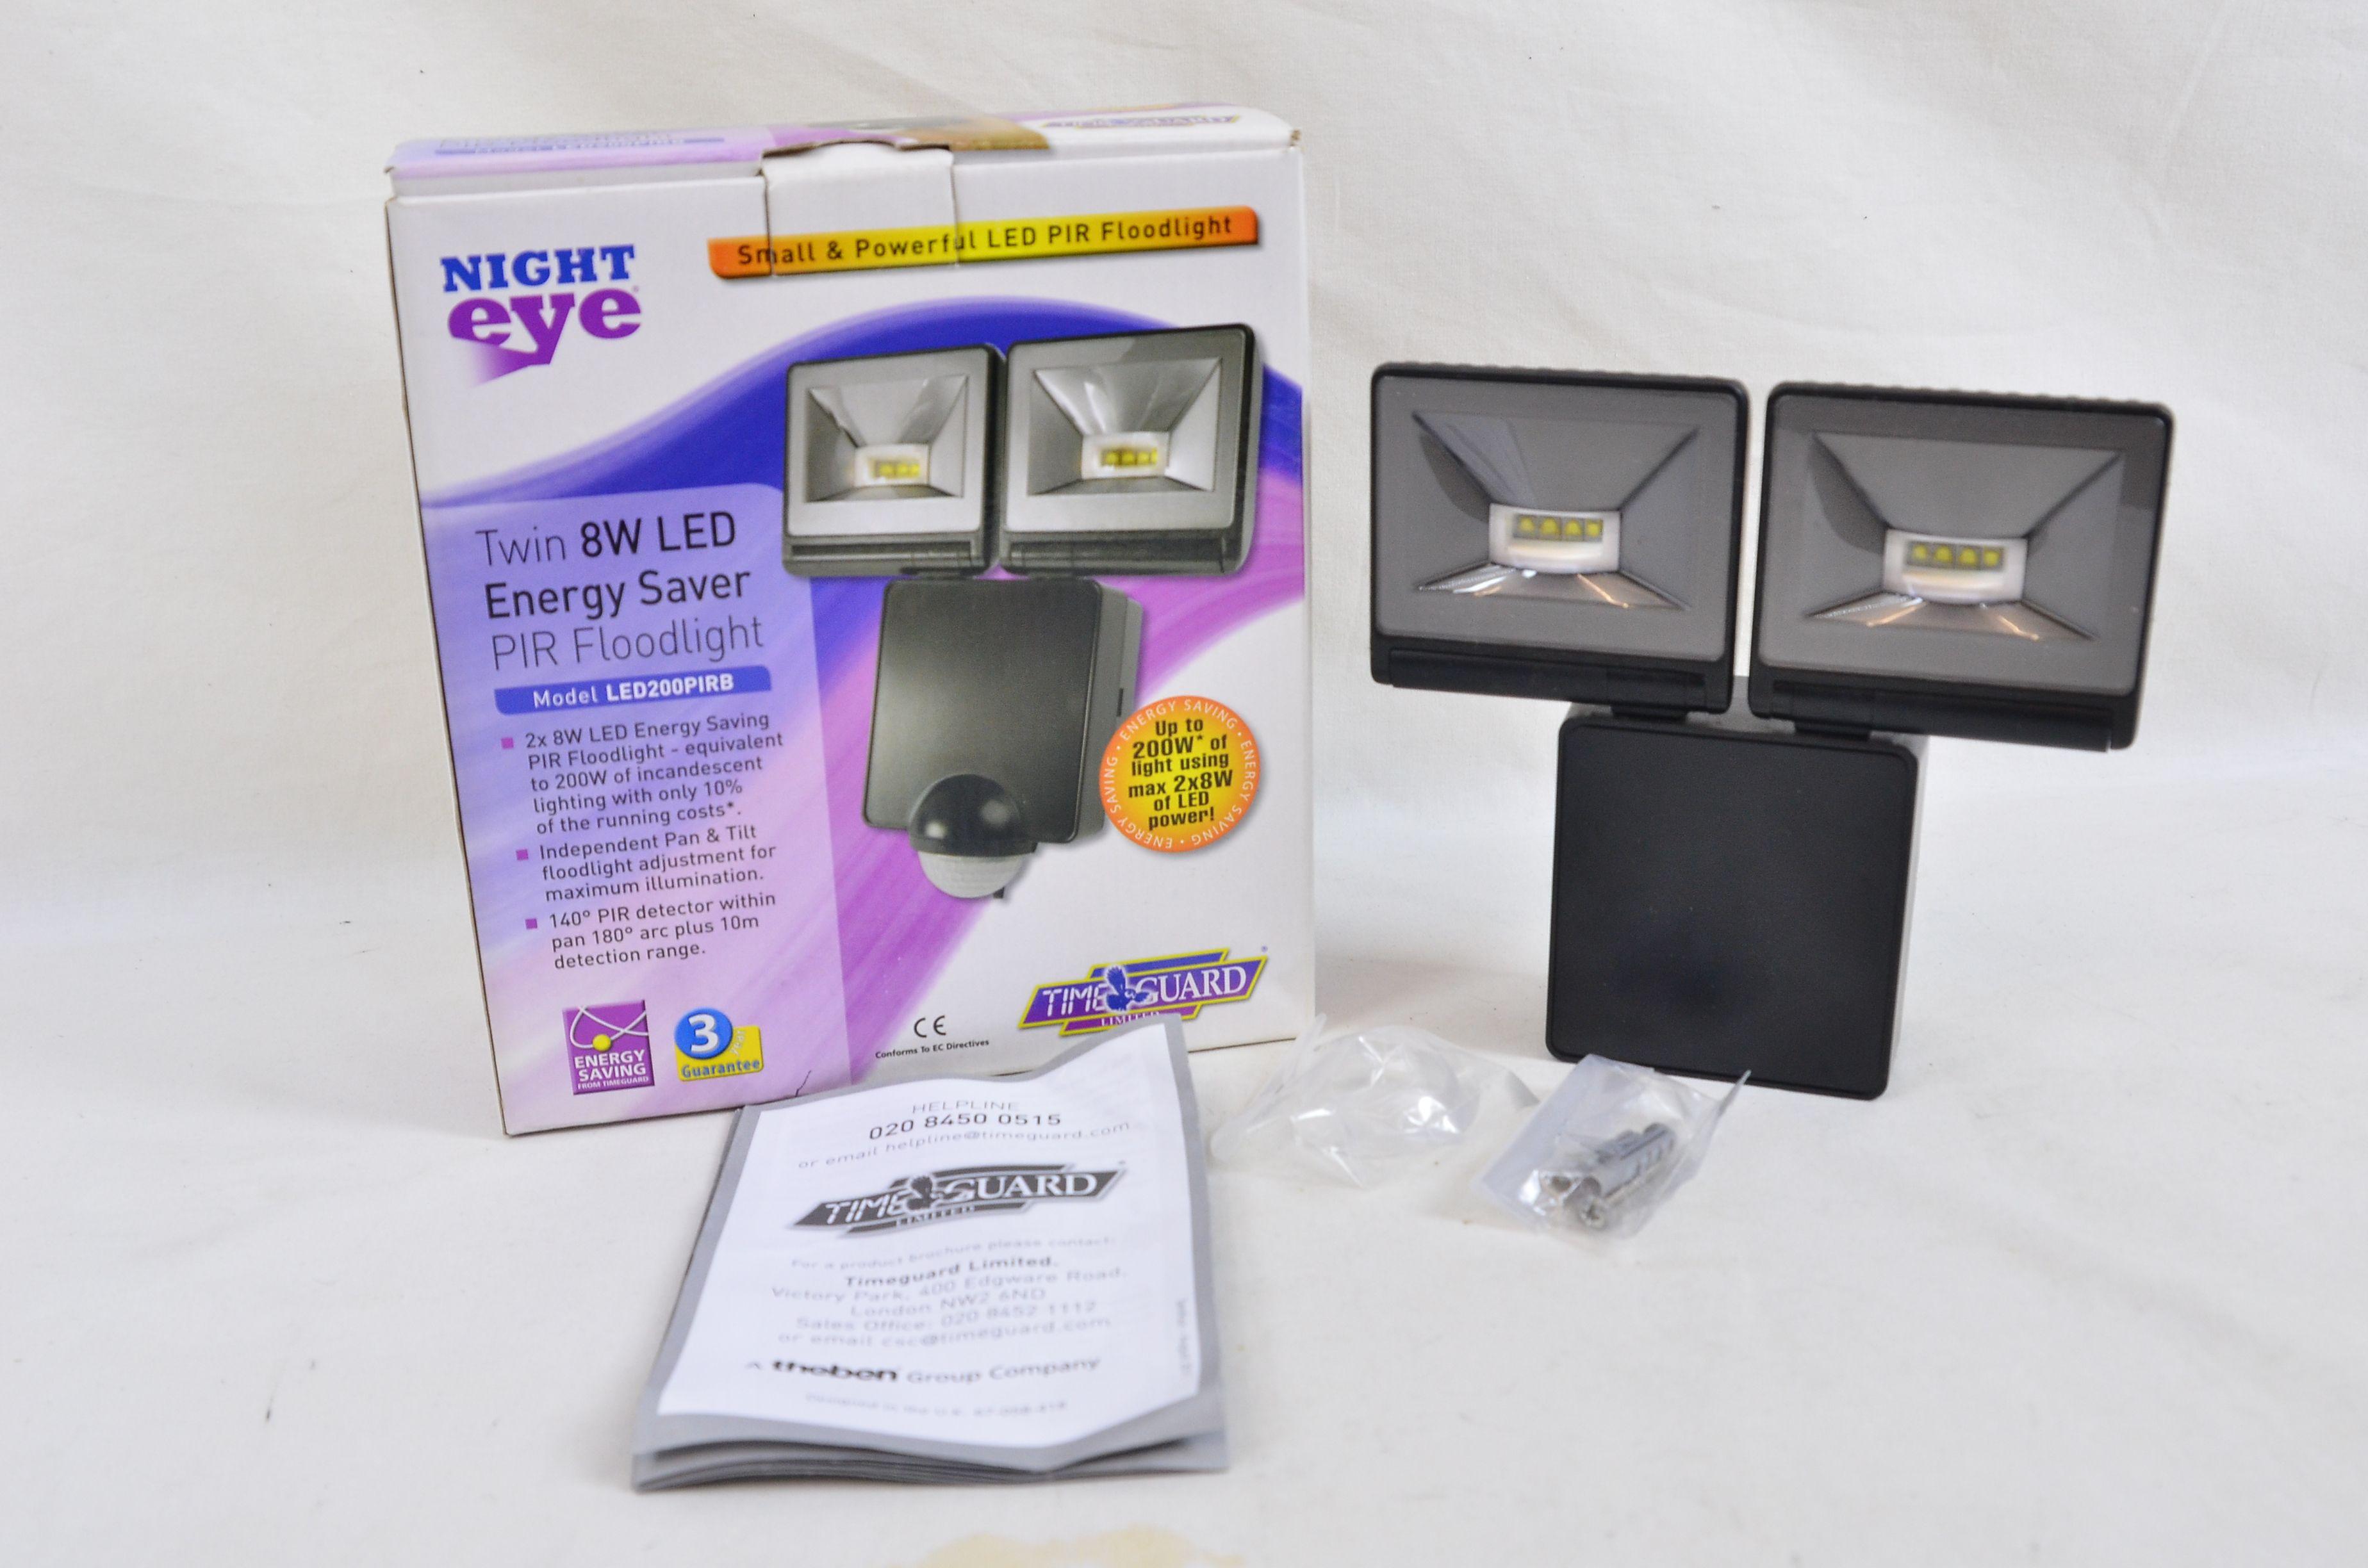 Timeguard Night Eye Twin 8W LED Energy Saver Floodlight LED200FLB Black Thumbnail 1